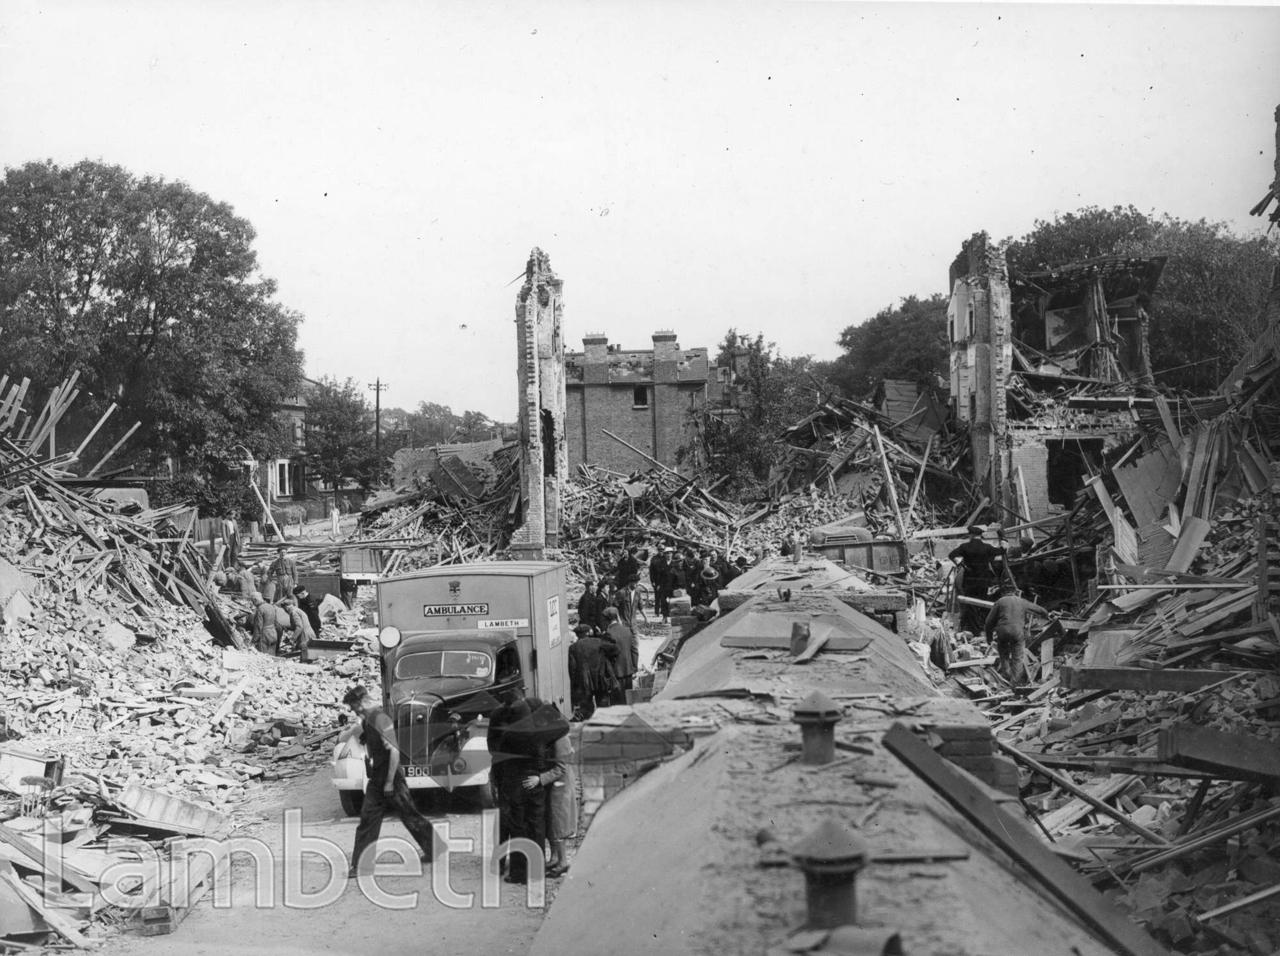 RUMSEY ROAD, BRIXTON: WORLD WAR II INCIDENT